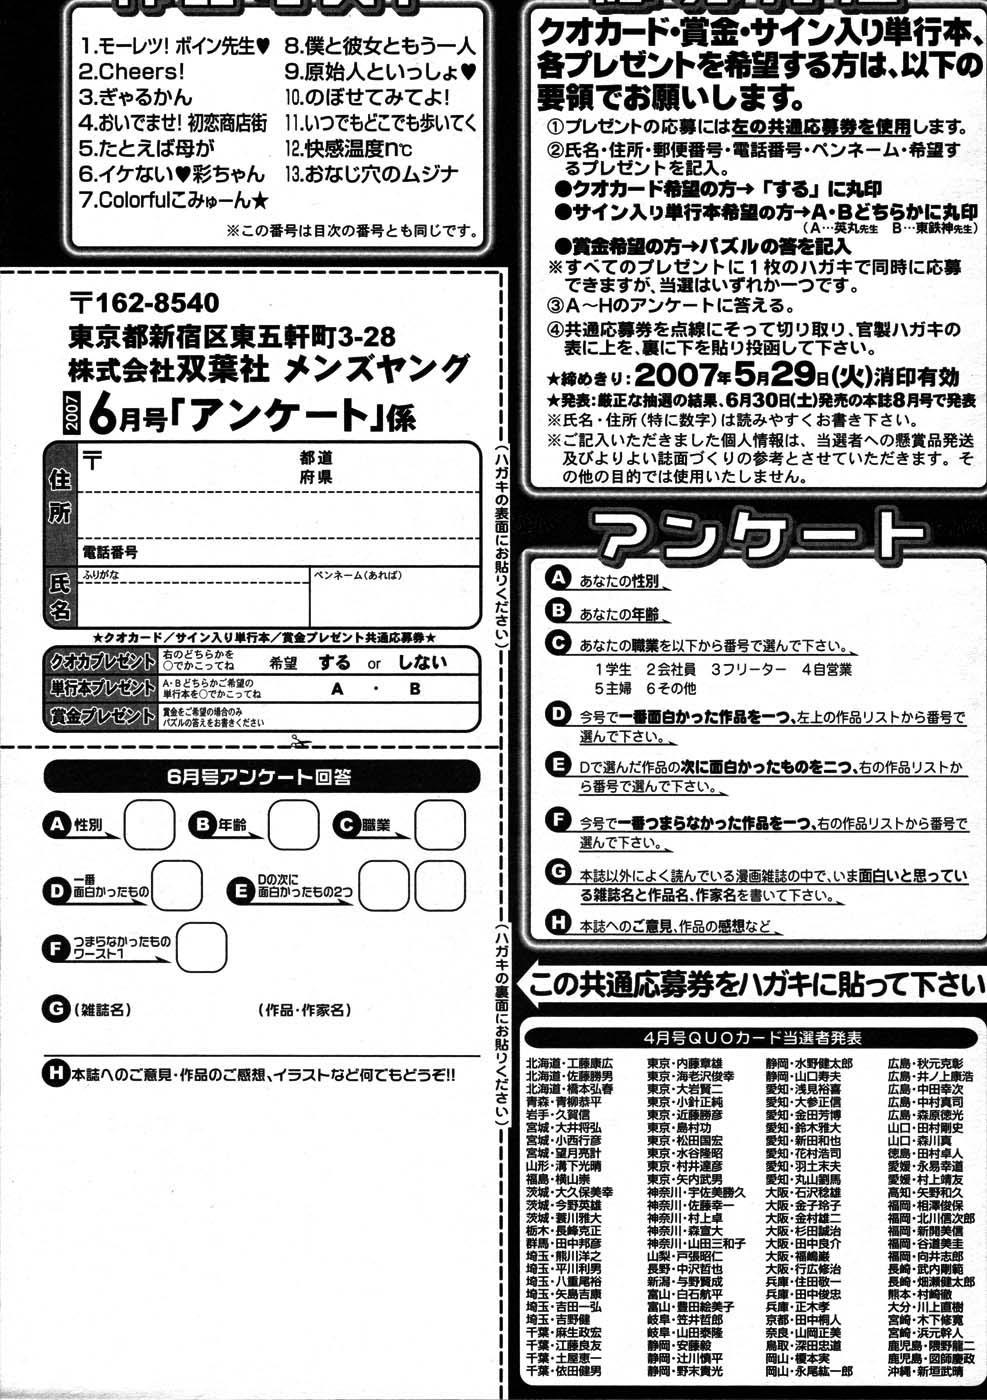 Men's Young 2007-06 264